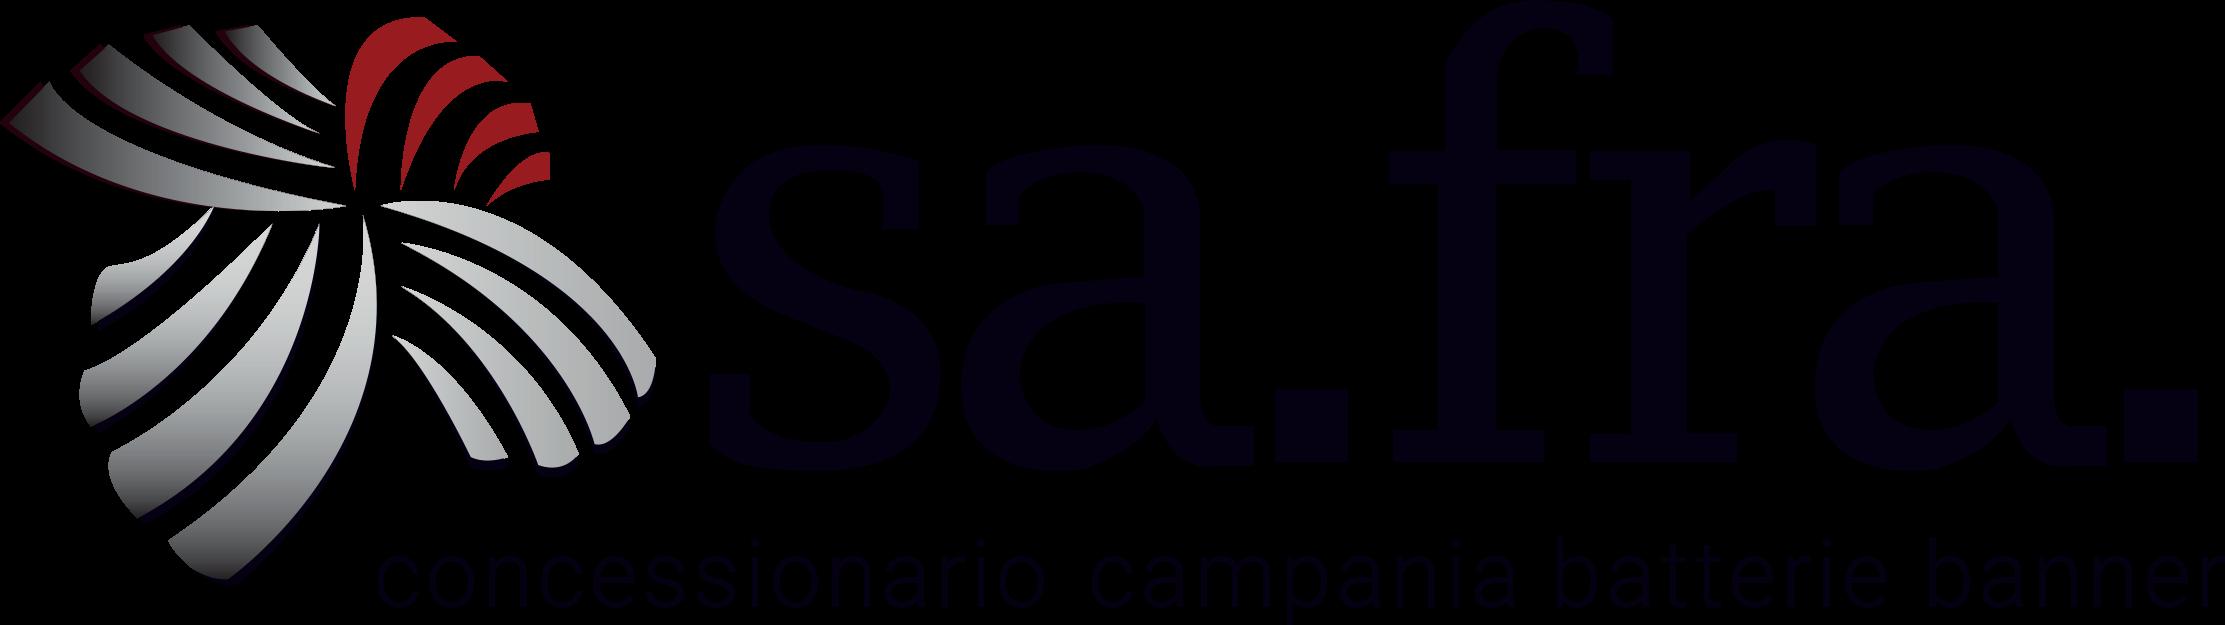 Sa.Fra Ricambi e Smedile Fc Napoli : La partnership inizia!